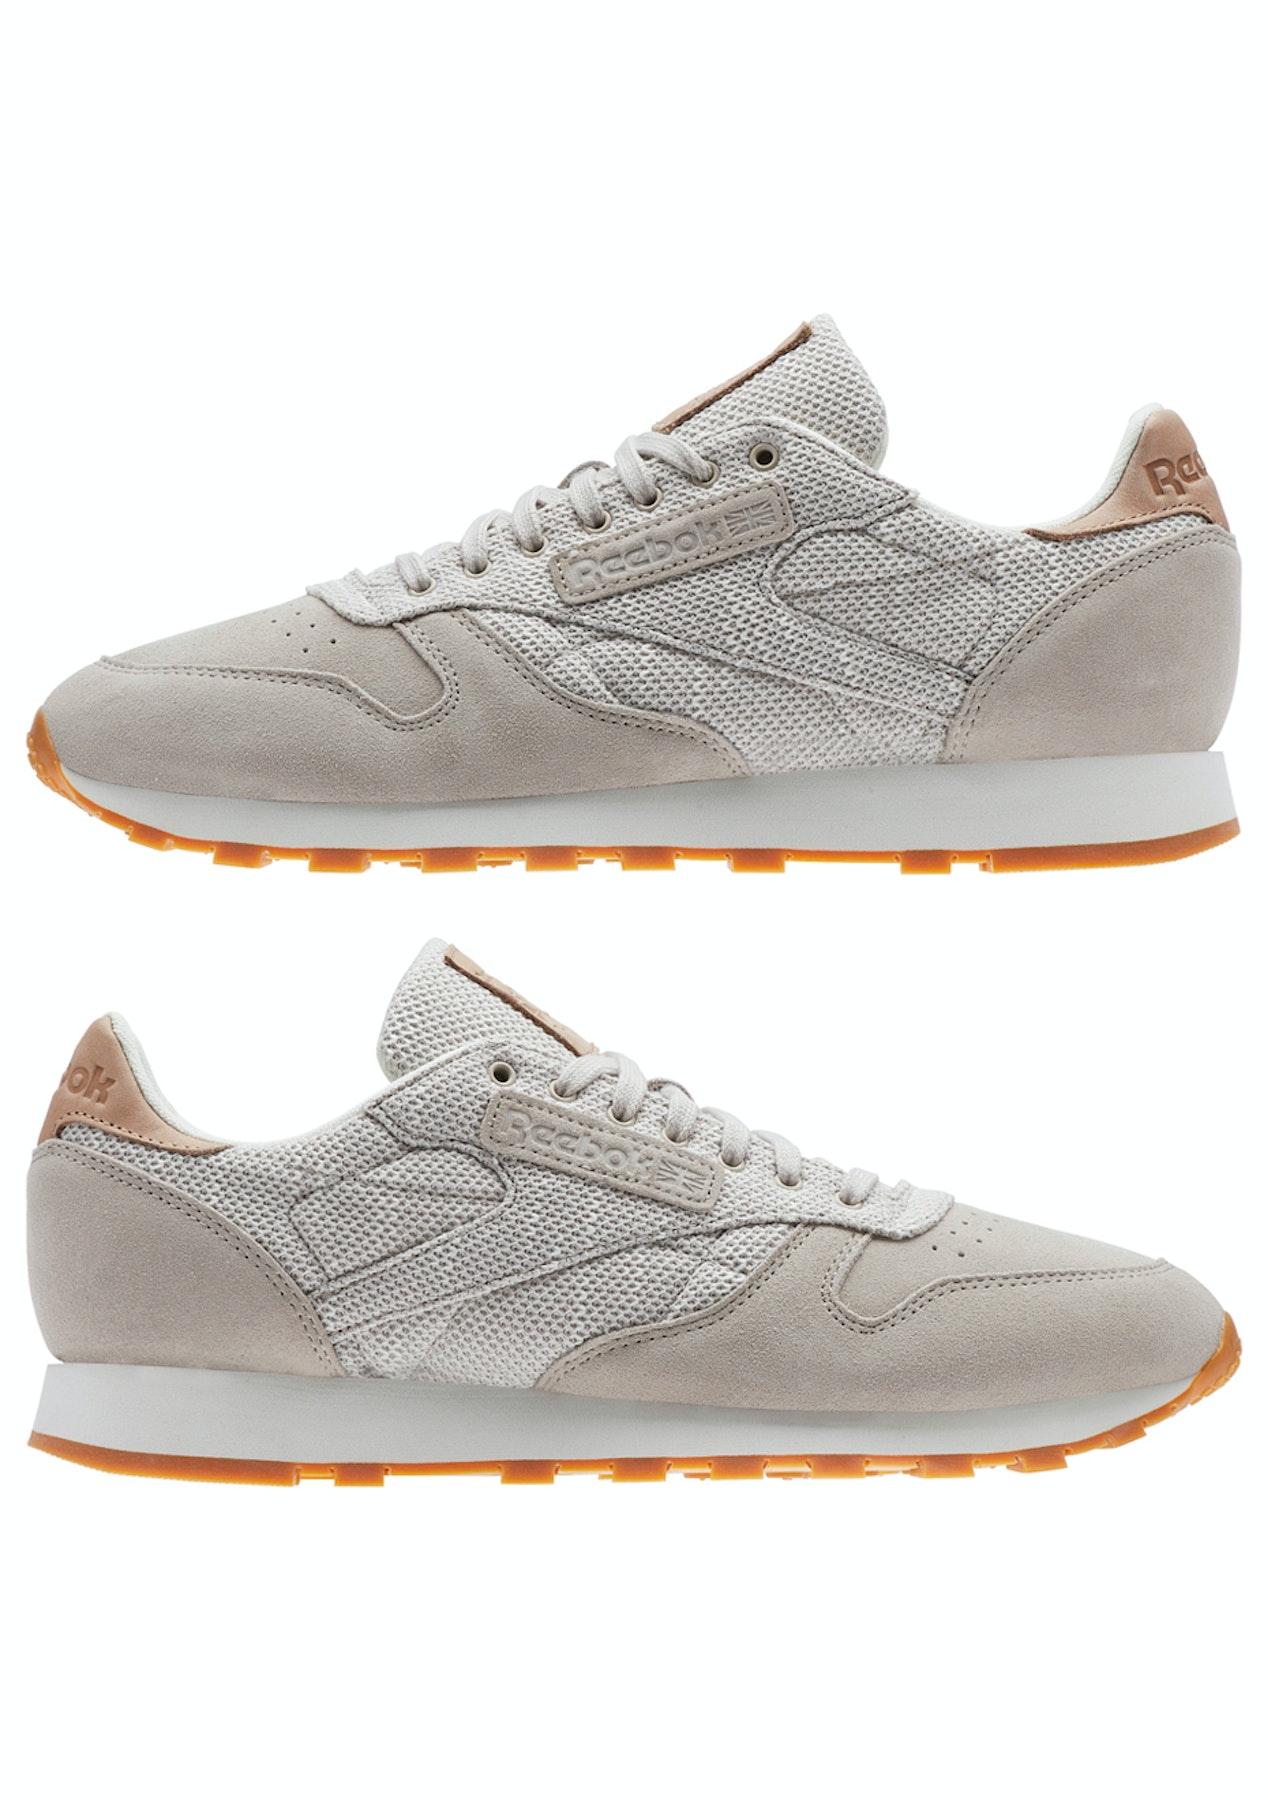 1577557d8ff Reebok Mens - Cl Leather Ebk - Sandstone Chalk-Gum - Mega Menswear  Clearance - Onceit